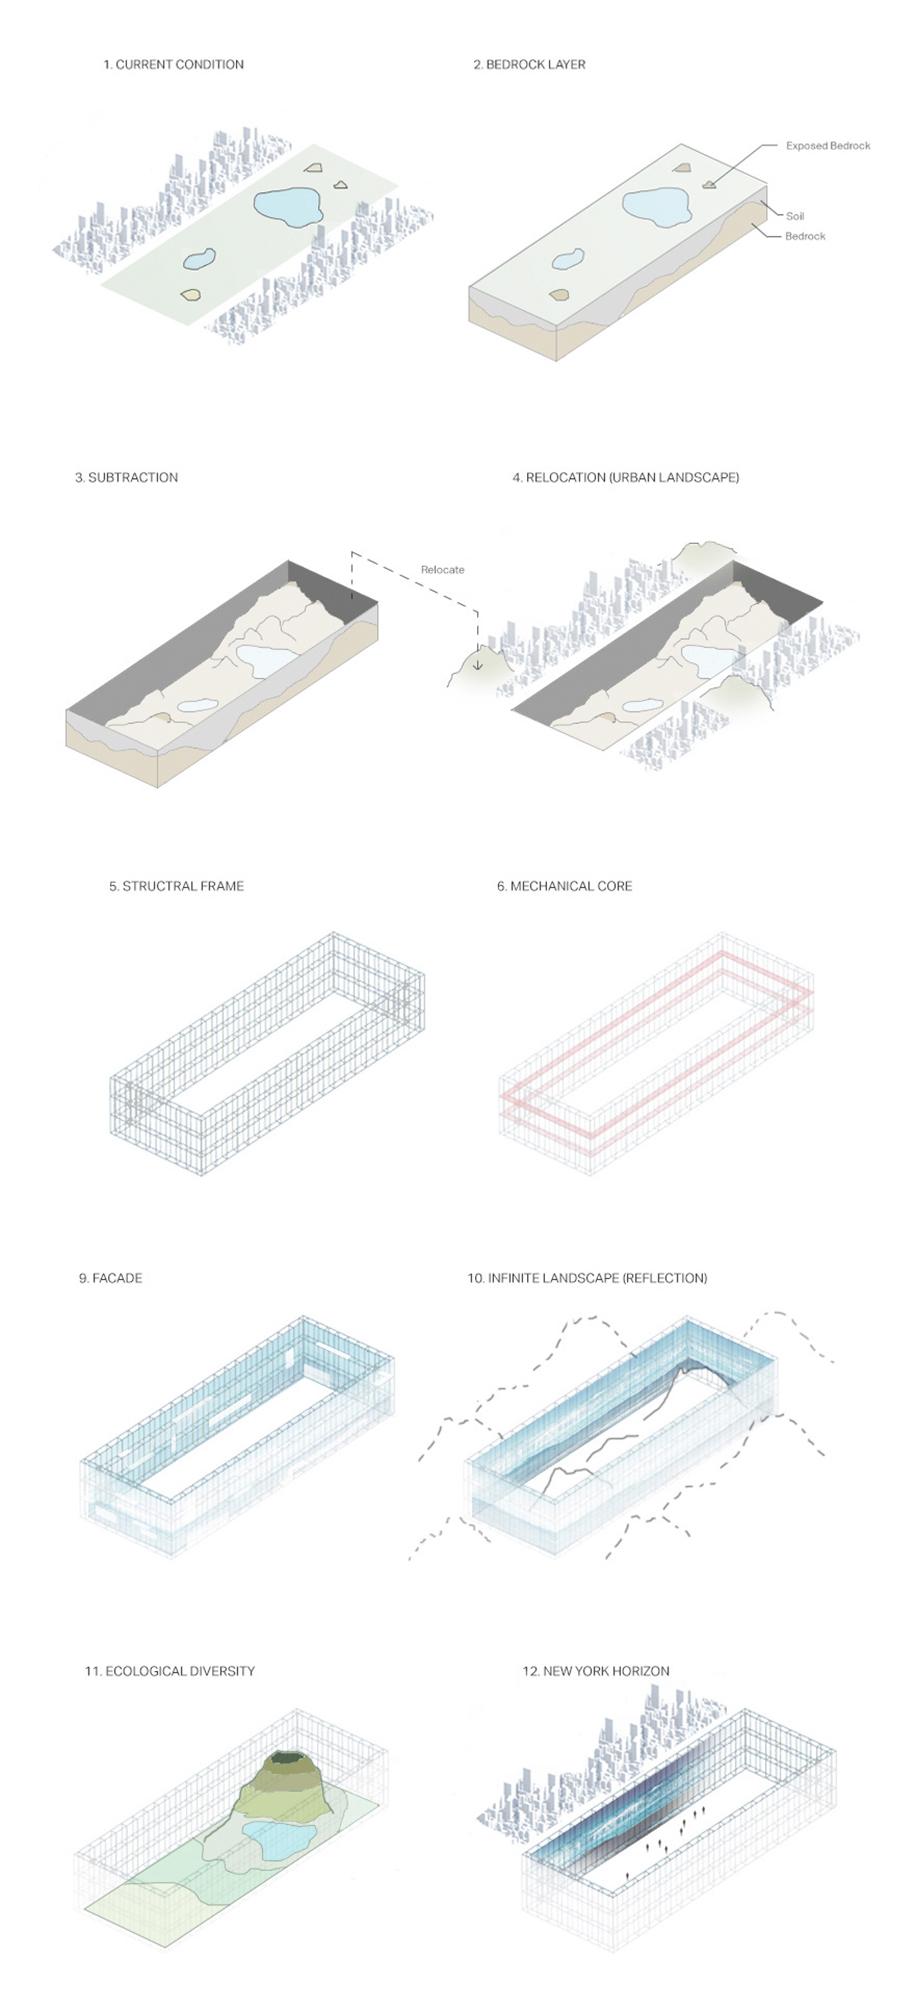 central-park-redesign-new-york-yitan-sun-jianshi-wu-evolo-skyscraper-competition-4